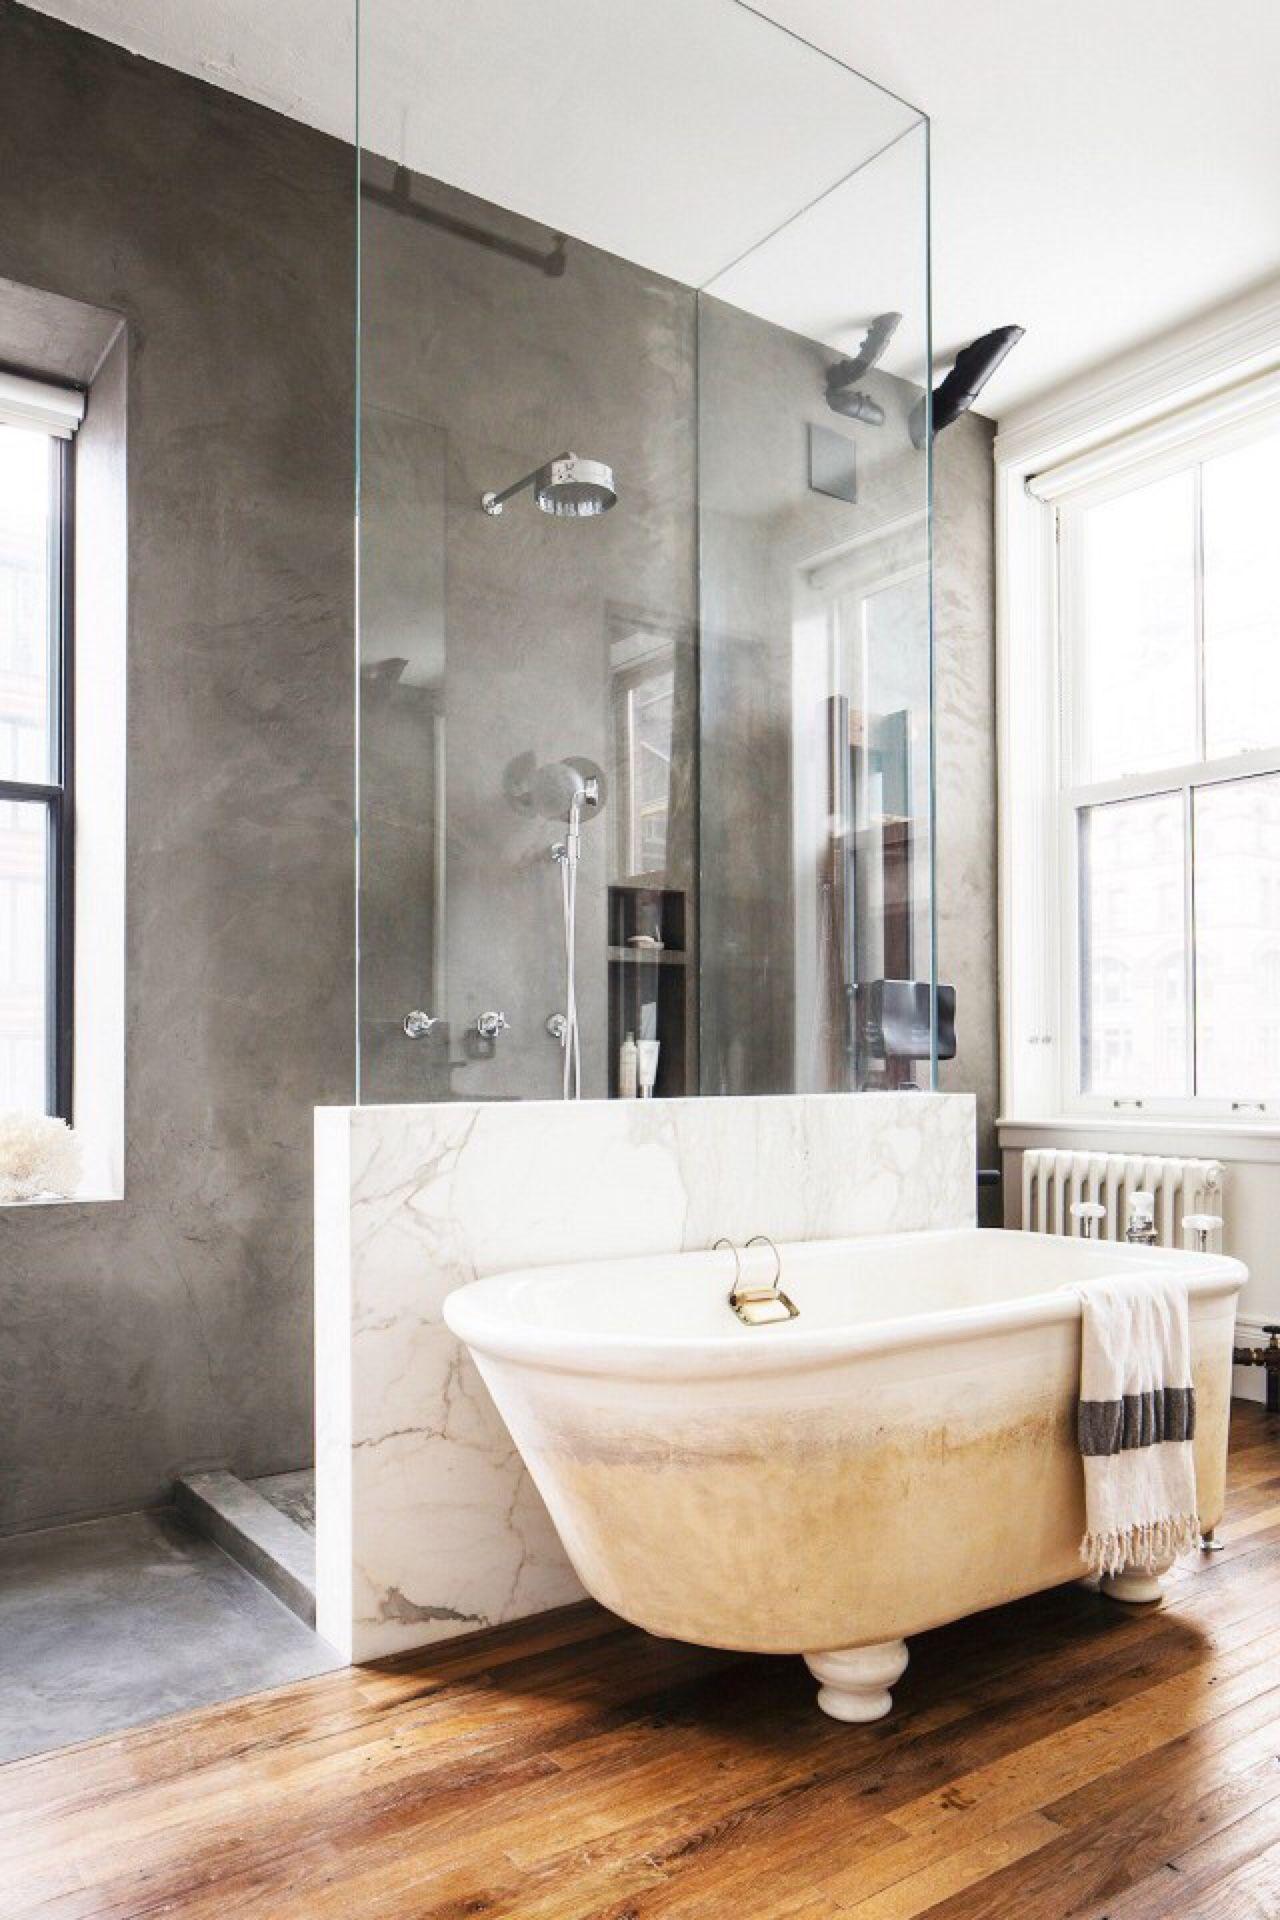 Meuble Salle De Bain Twist Brico Depot ~ Fine Interiors Photo Apartament Pinterest Interior Photo